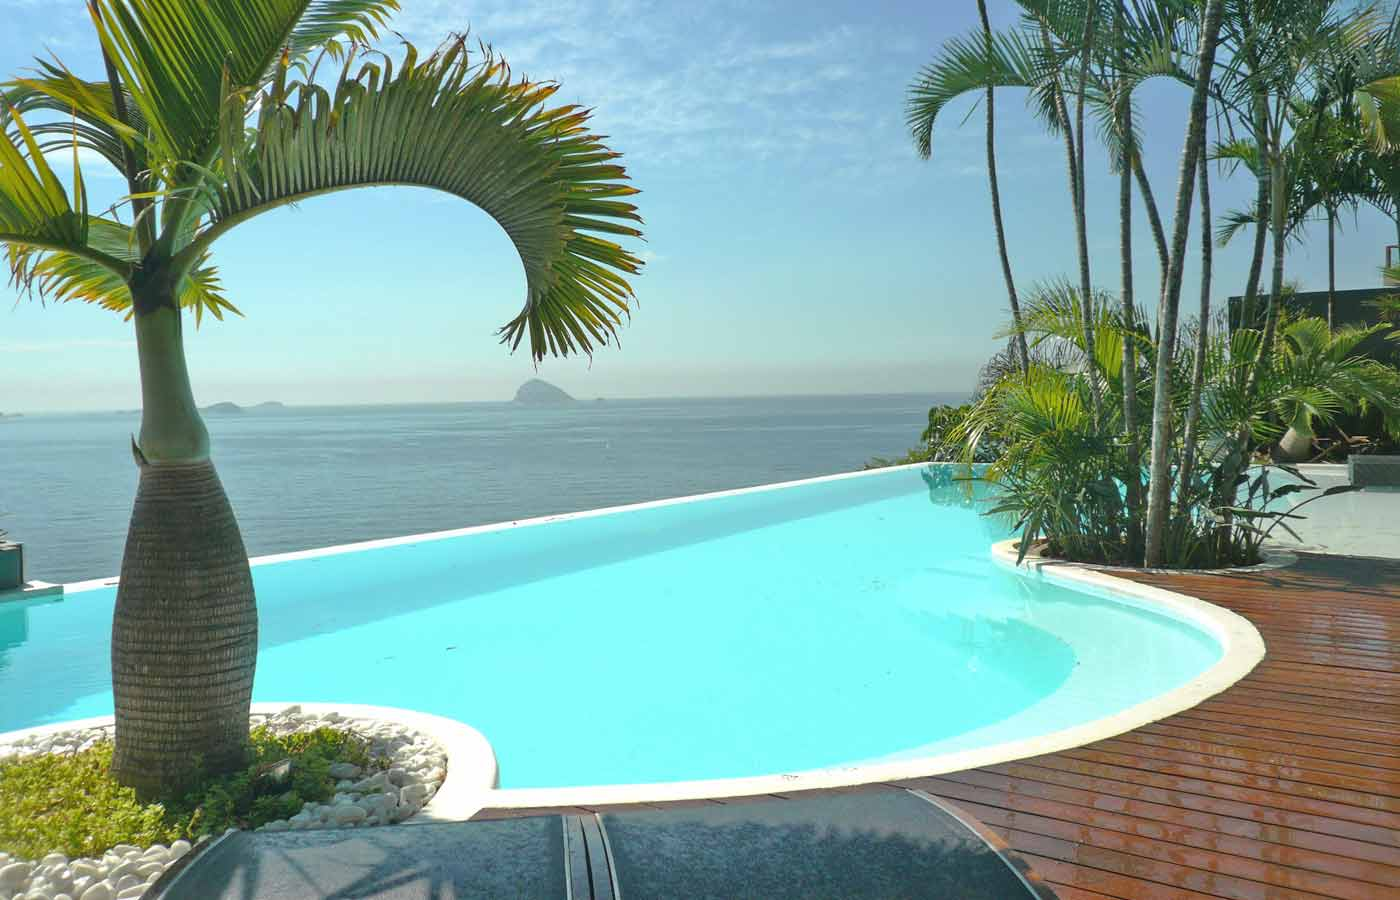 Hotel La Suite - Luxury holiday to Rio de Janeiro, Brazil